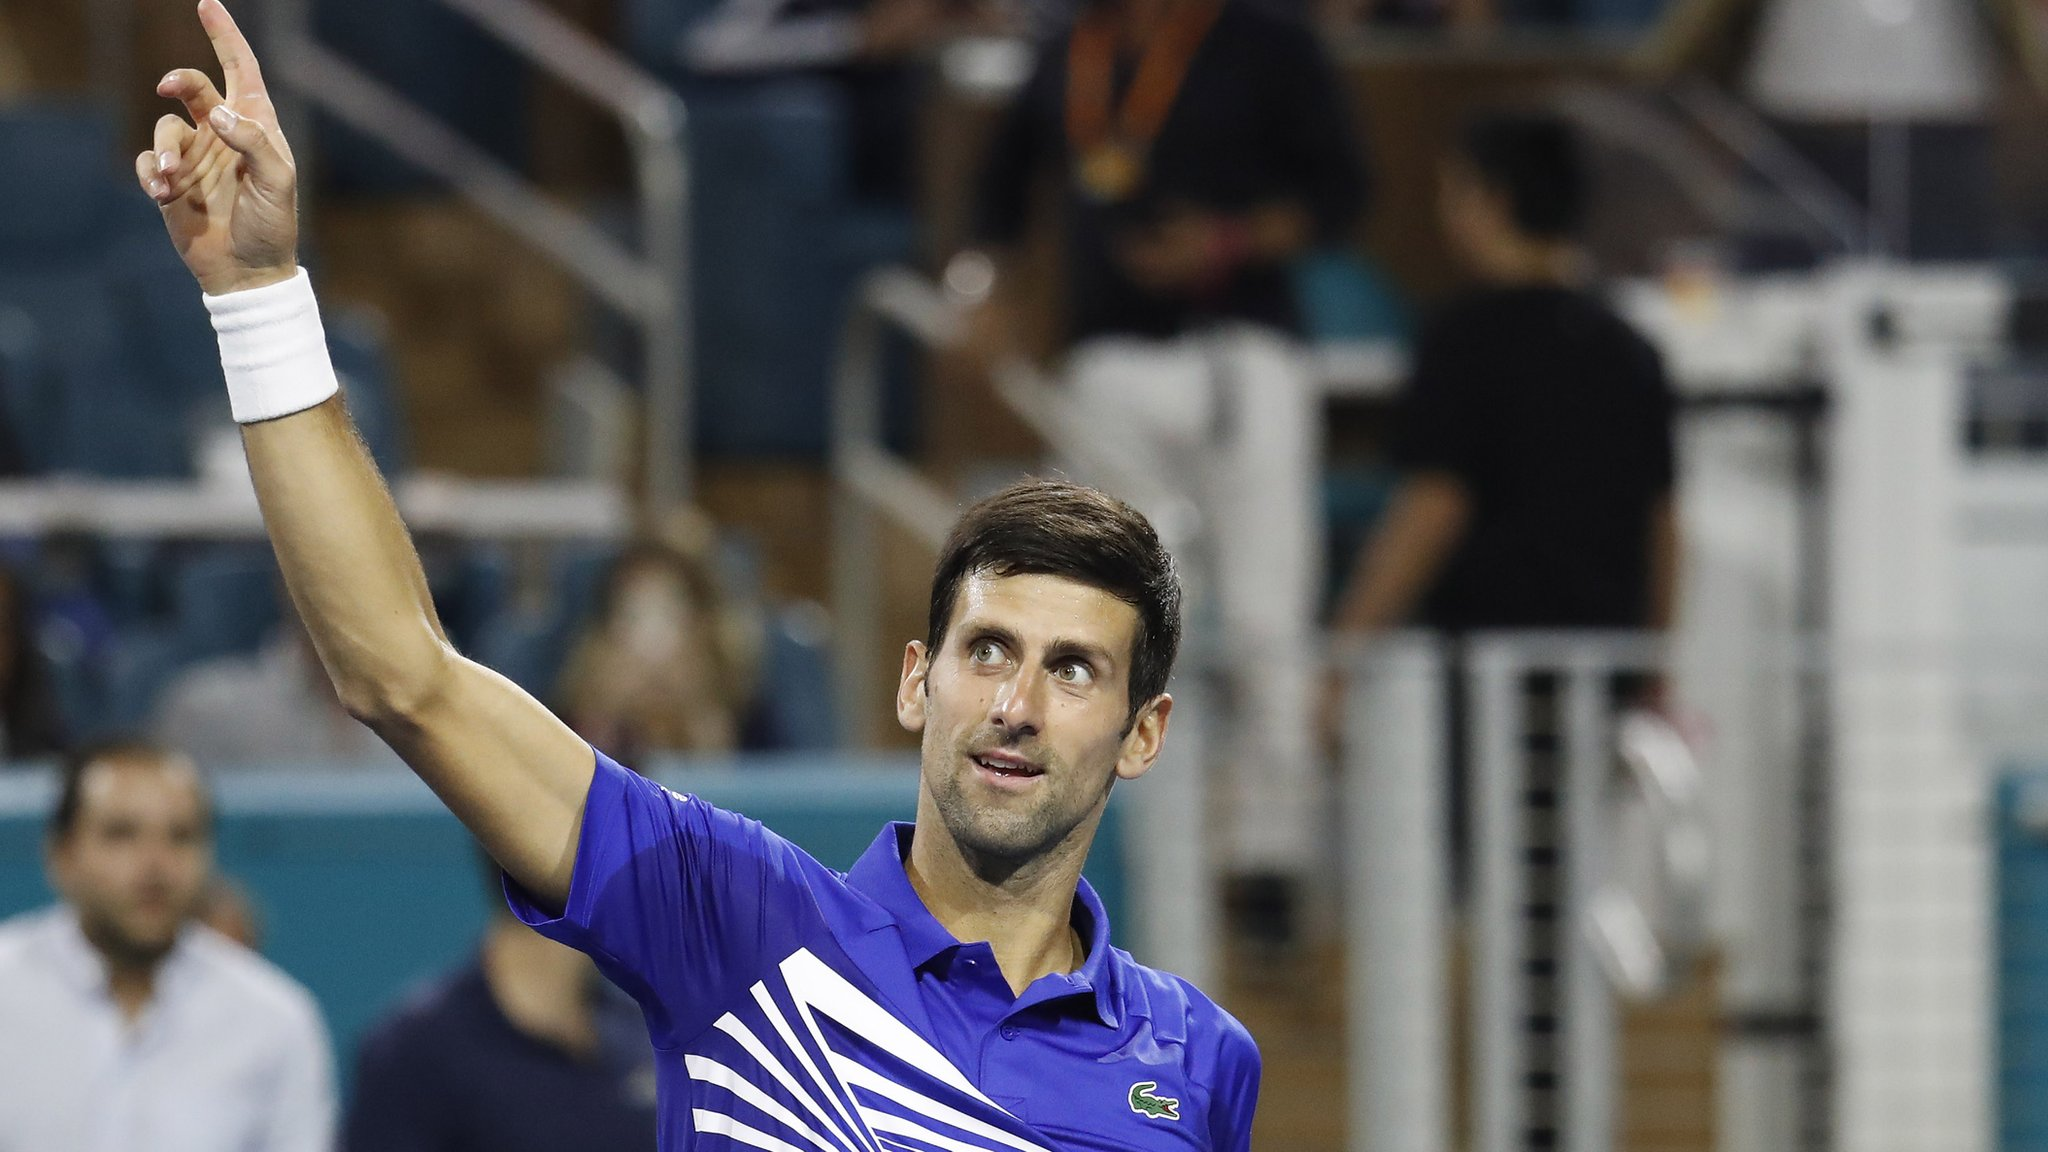 Djokovic beats Tomic in Miami in bid for record seventh title